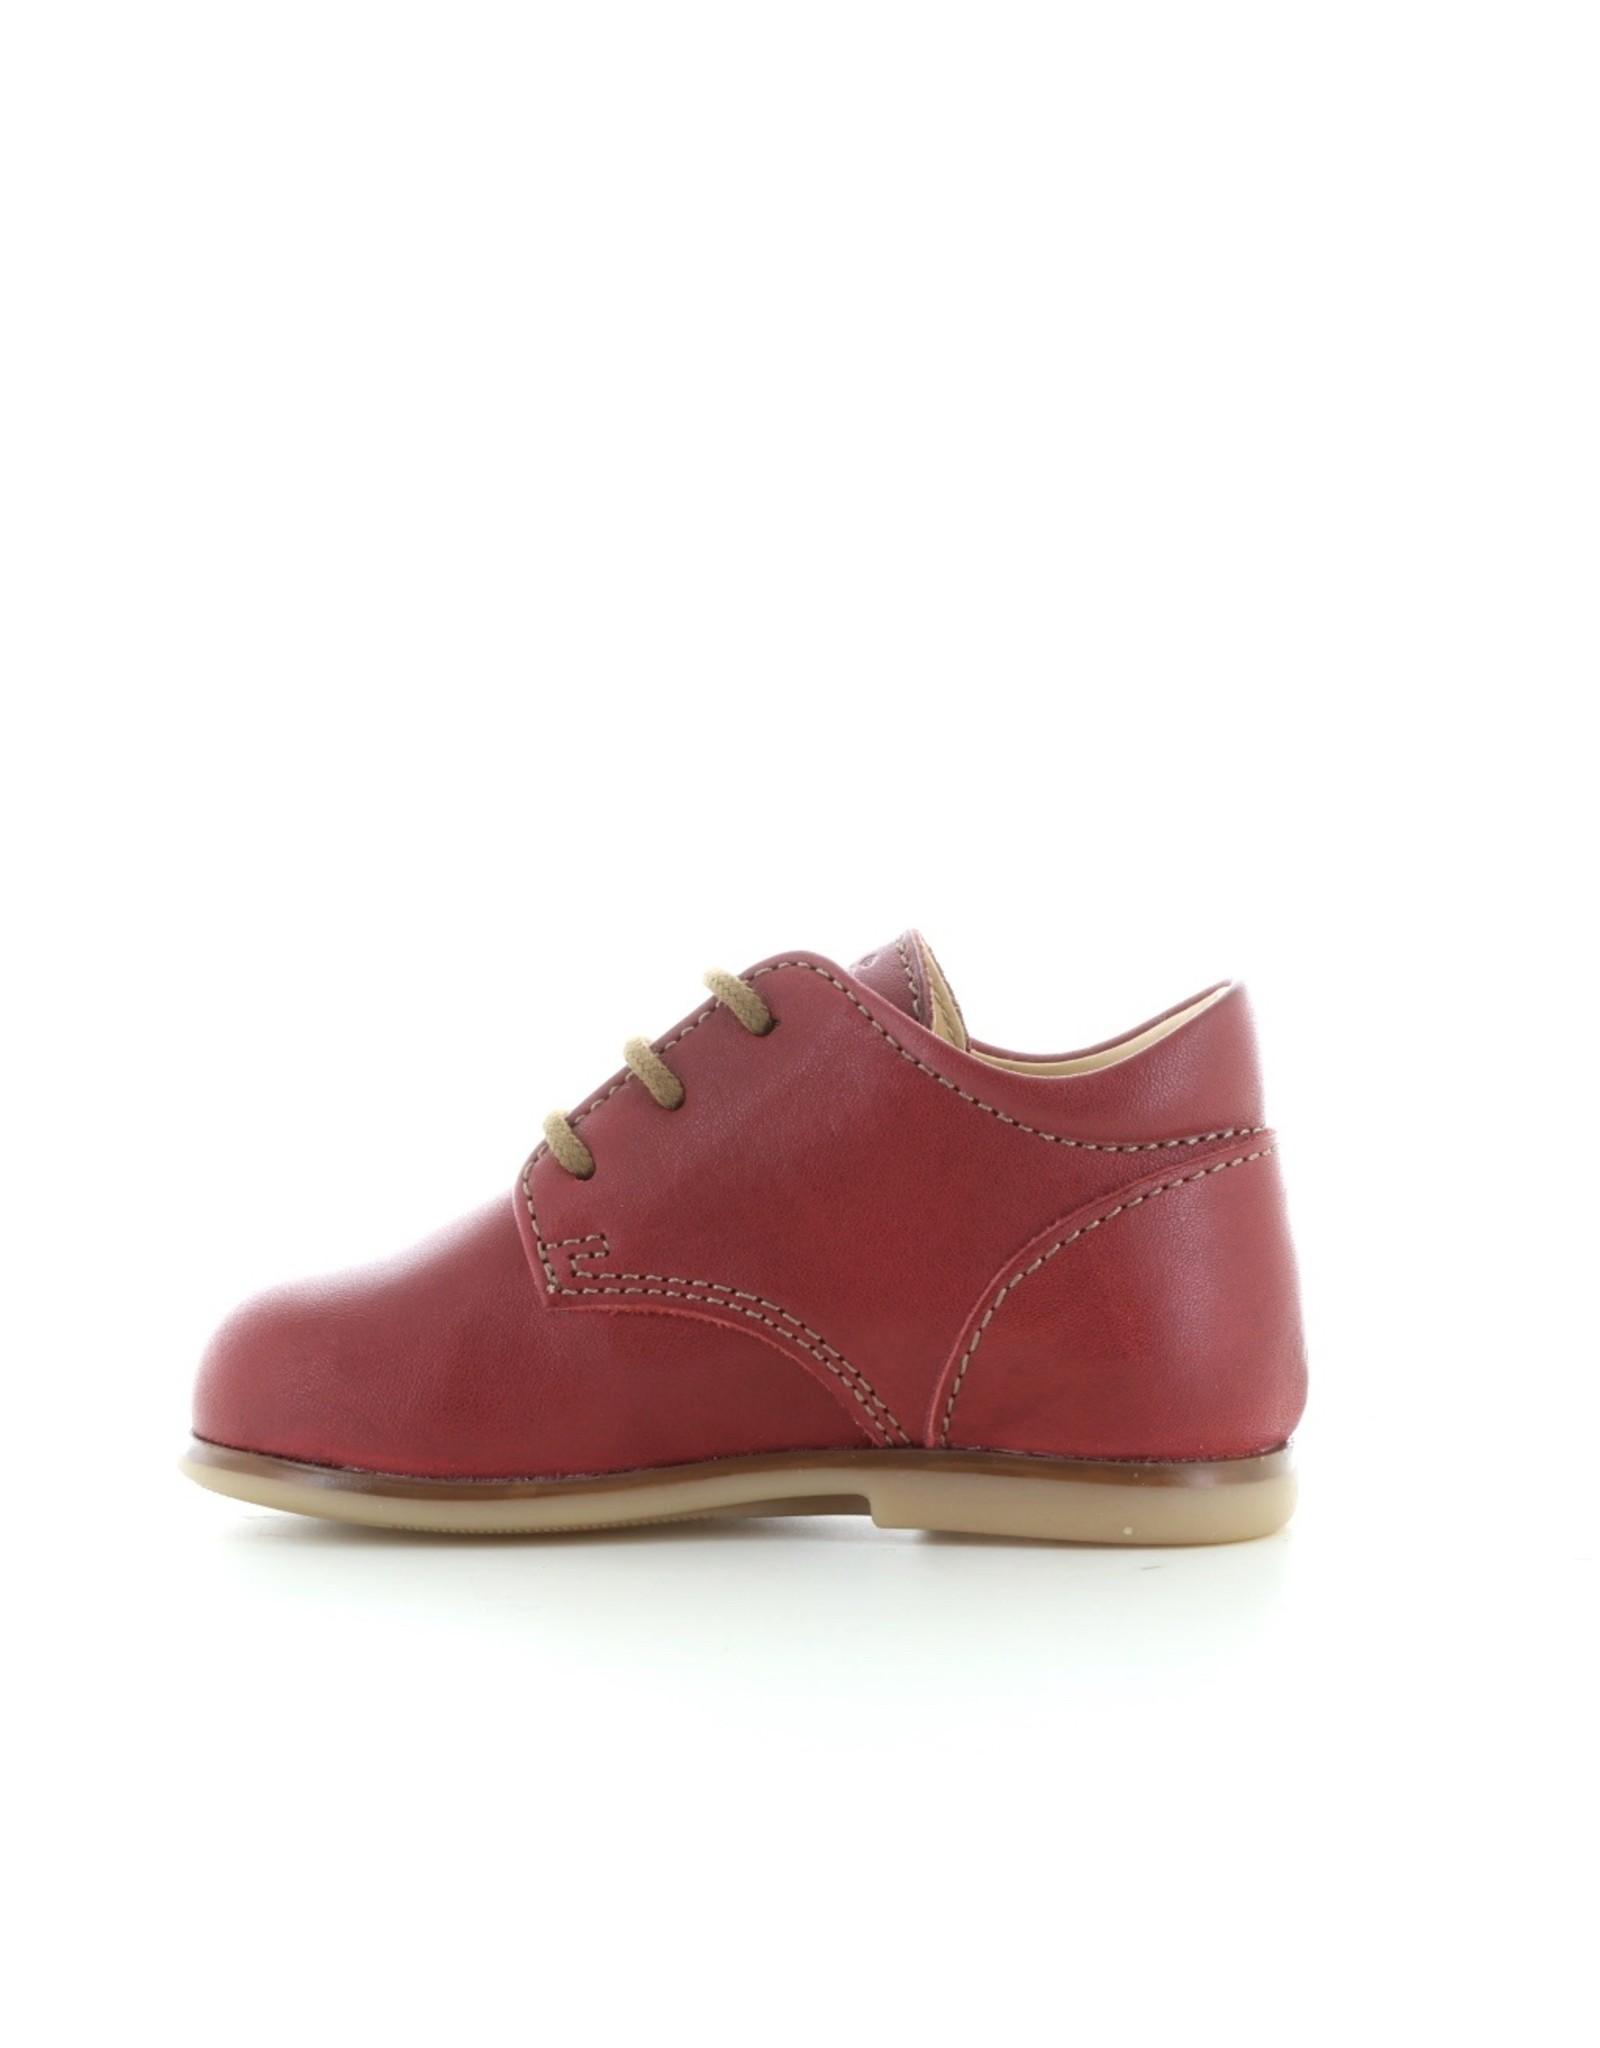 Ocra 625 red